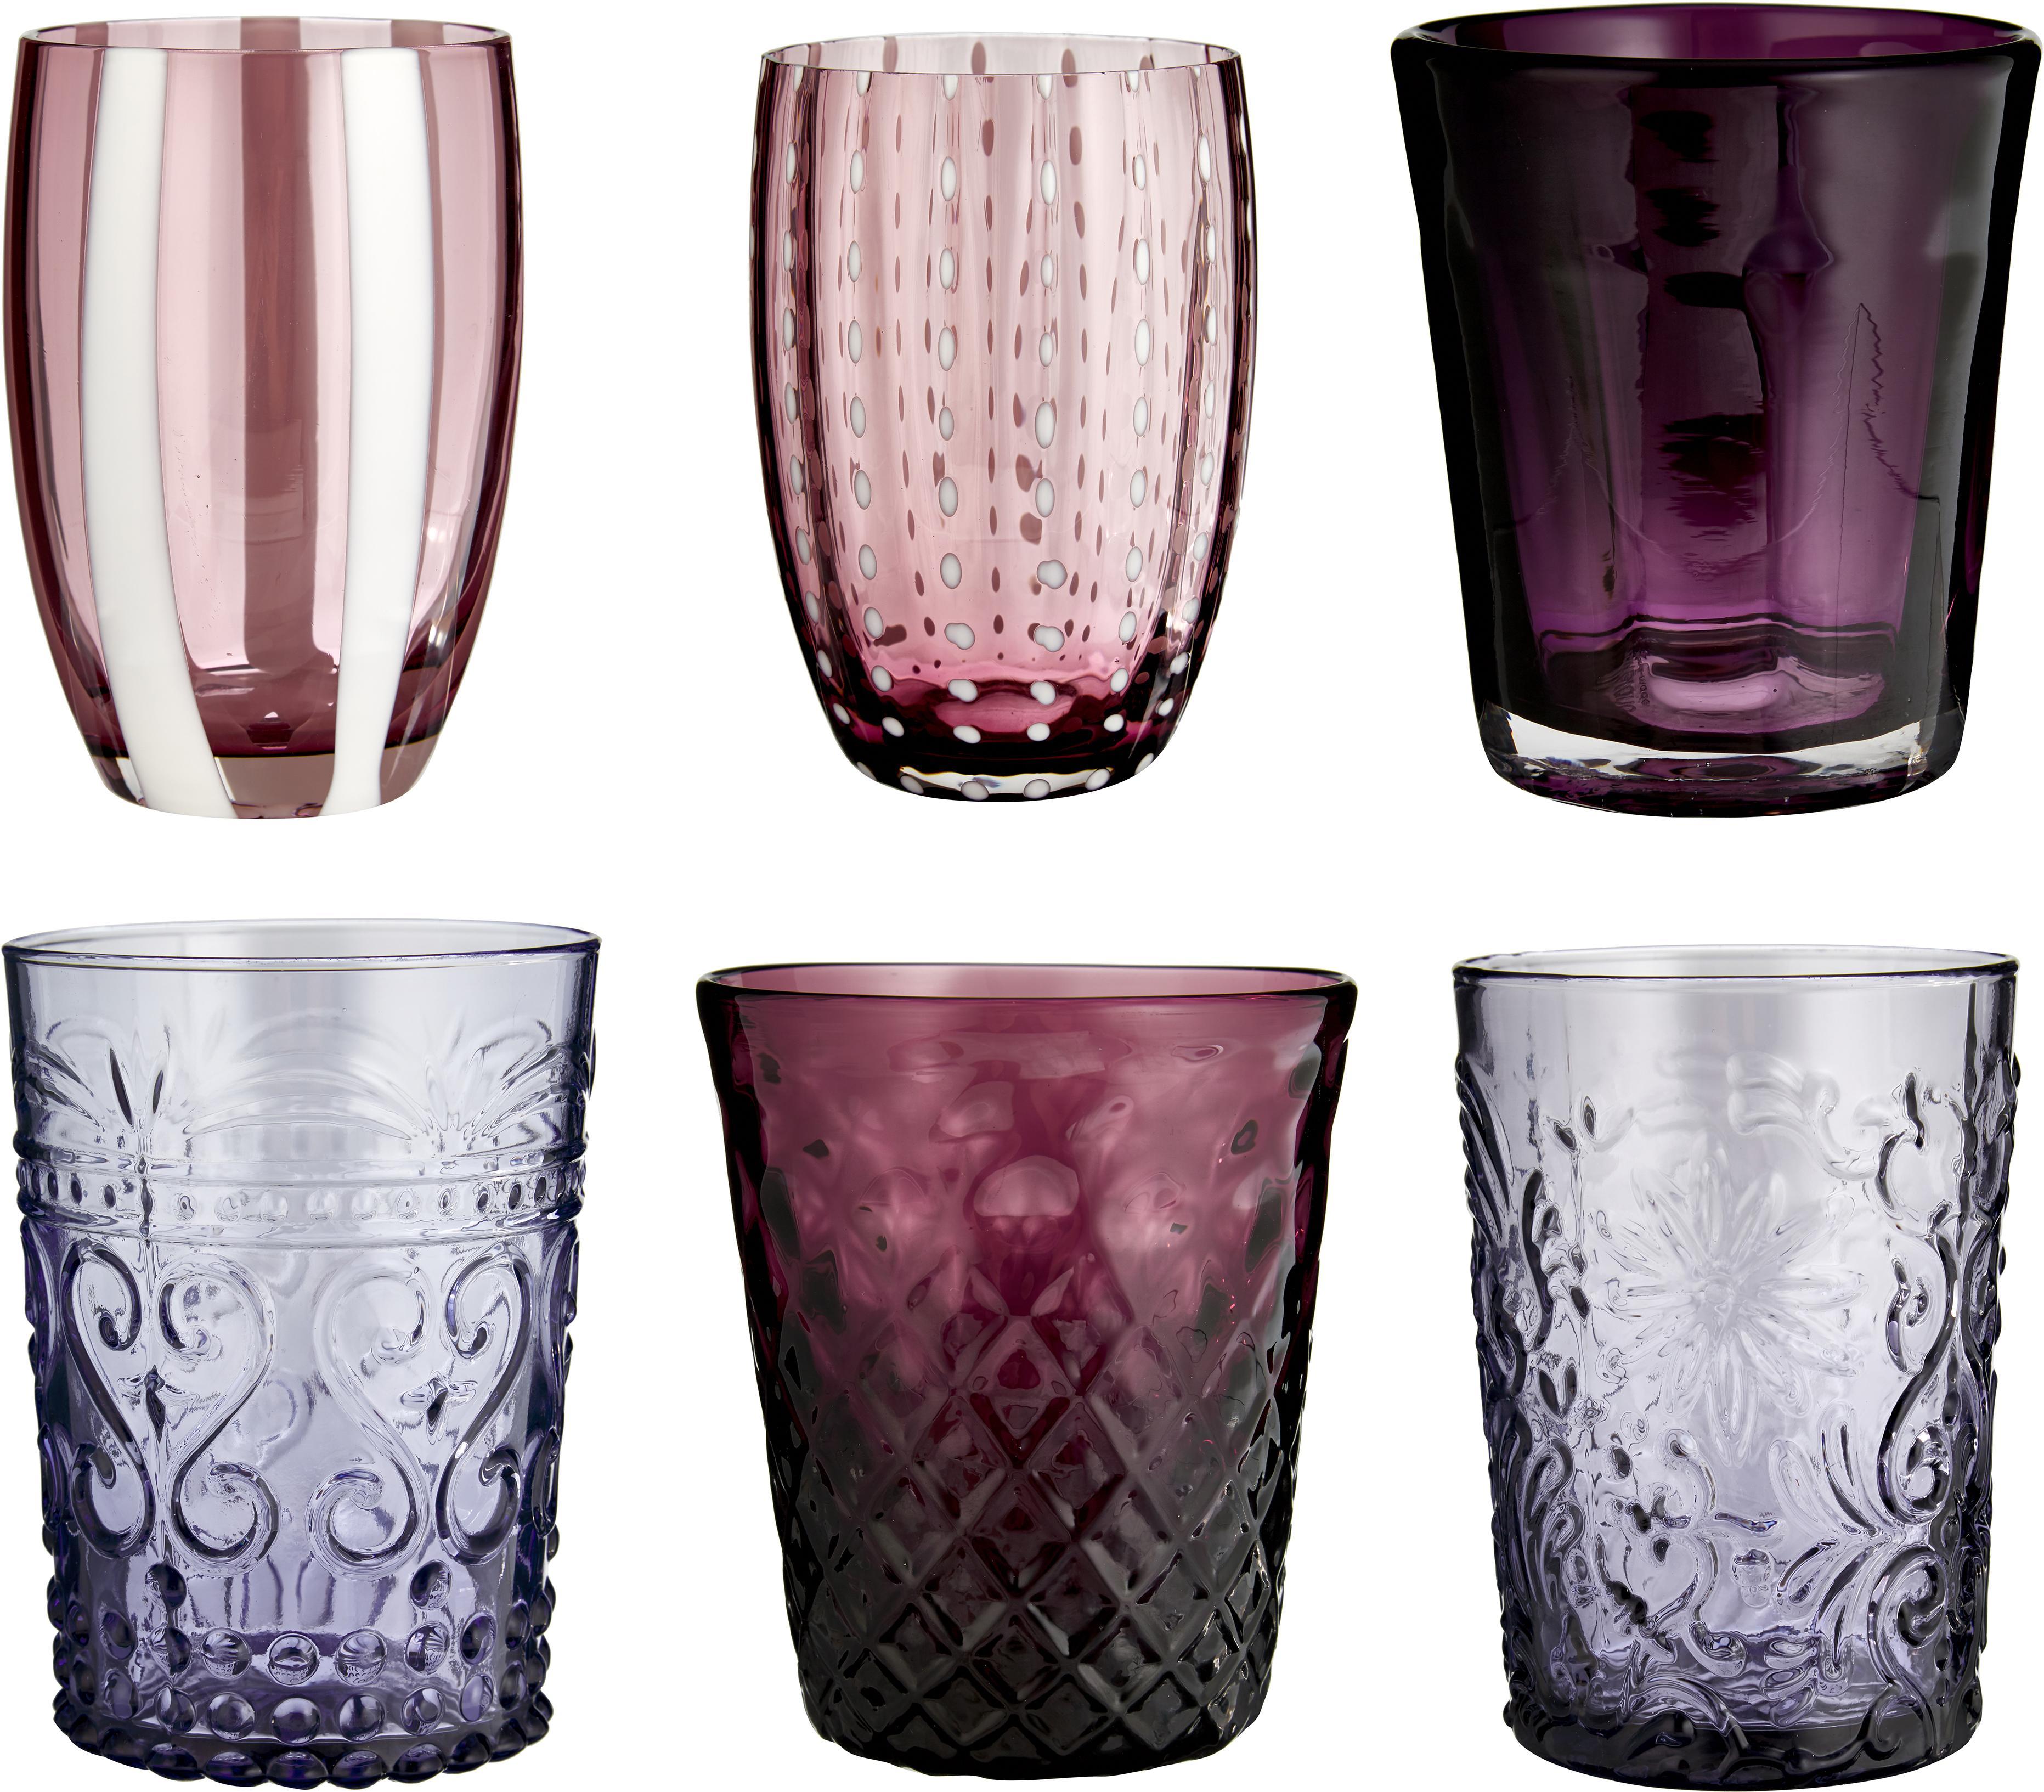 Vasos soplados artesanalmente Melting Pot Berry, 6uds., Vidrio, Azul, rojo, Set de diferentes tamaños